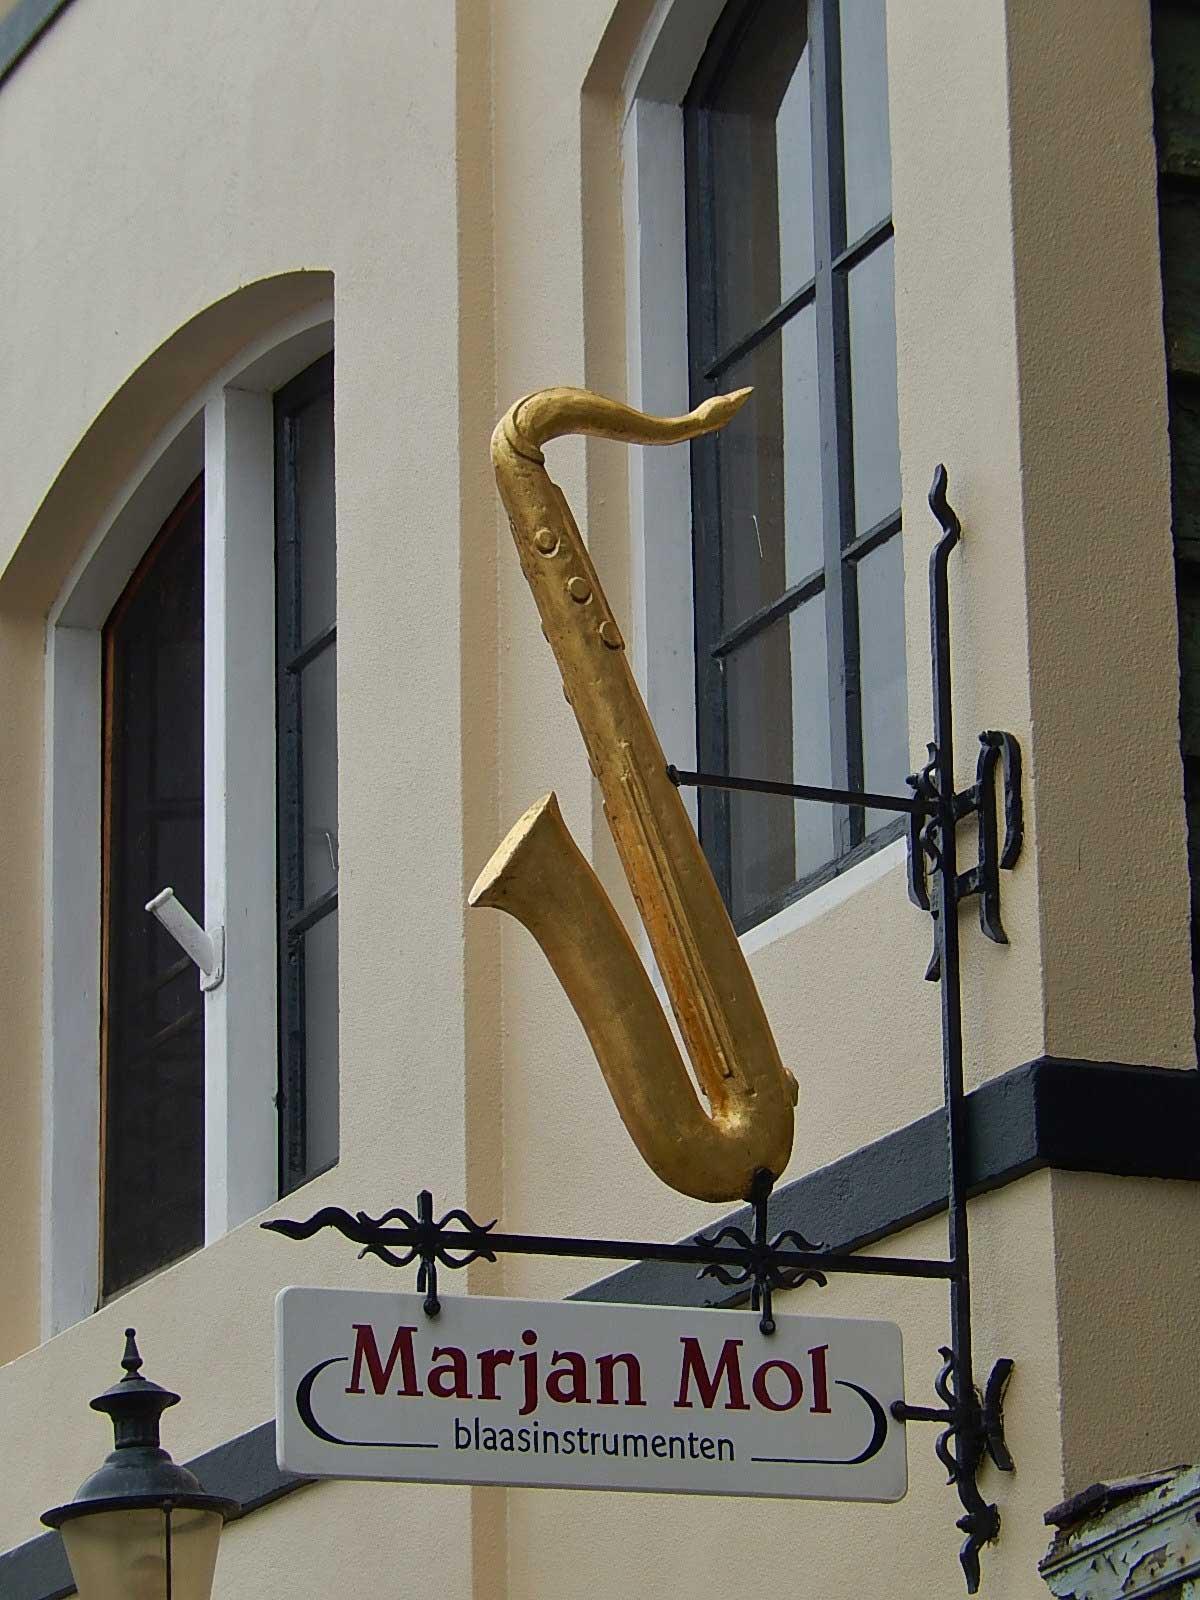 ornamental saxophone, ornamental sax, saxophone sculpture attached to building, Marjan Mol blaasinstumenten, Wormerveer, North Holland